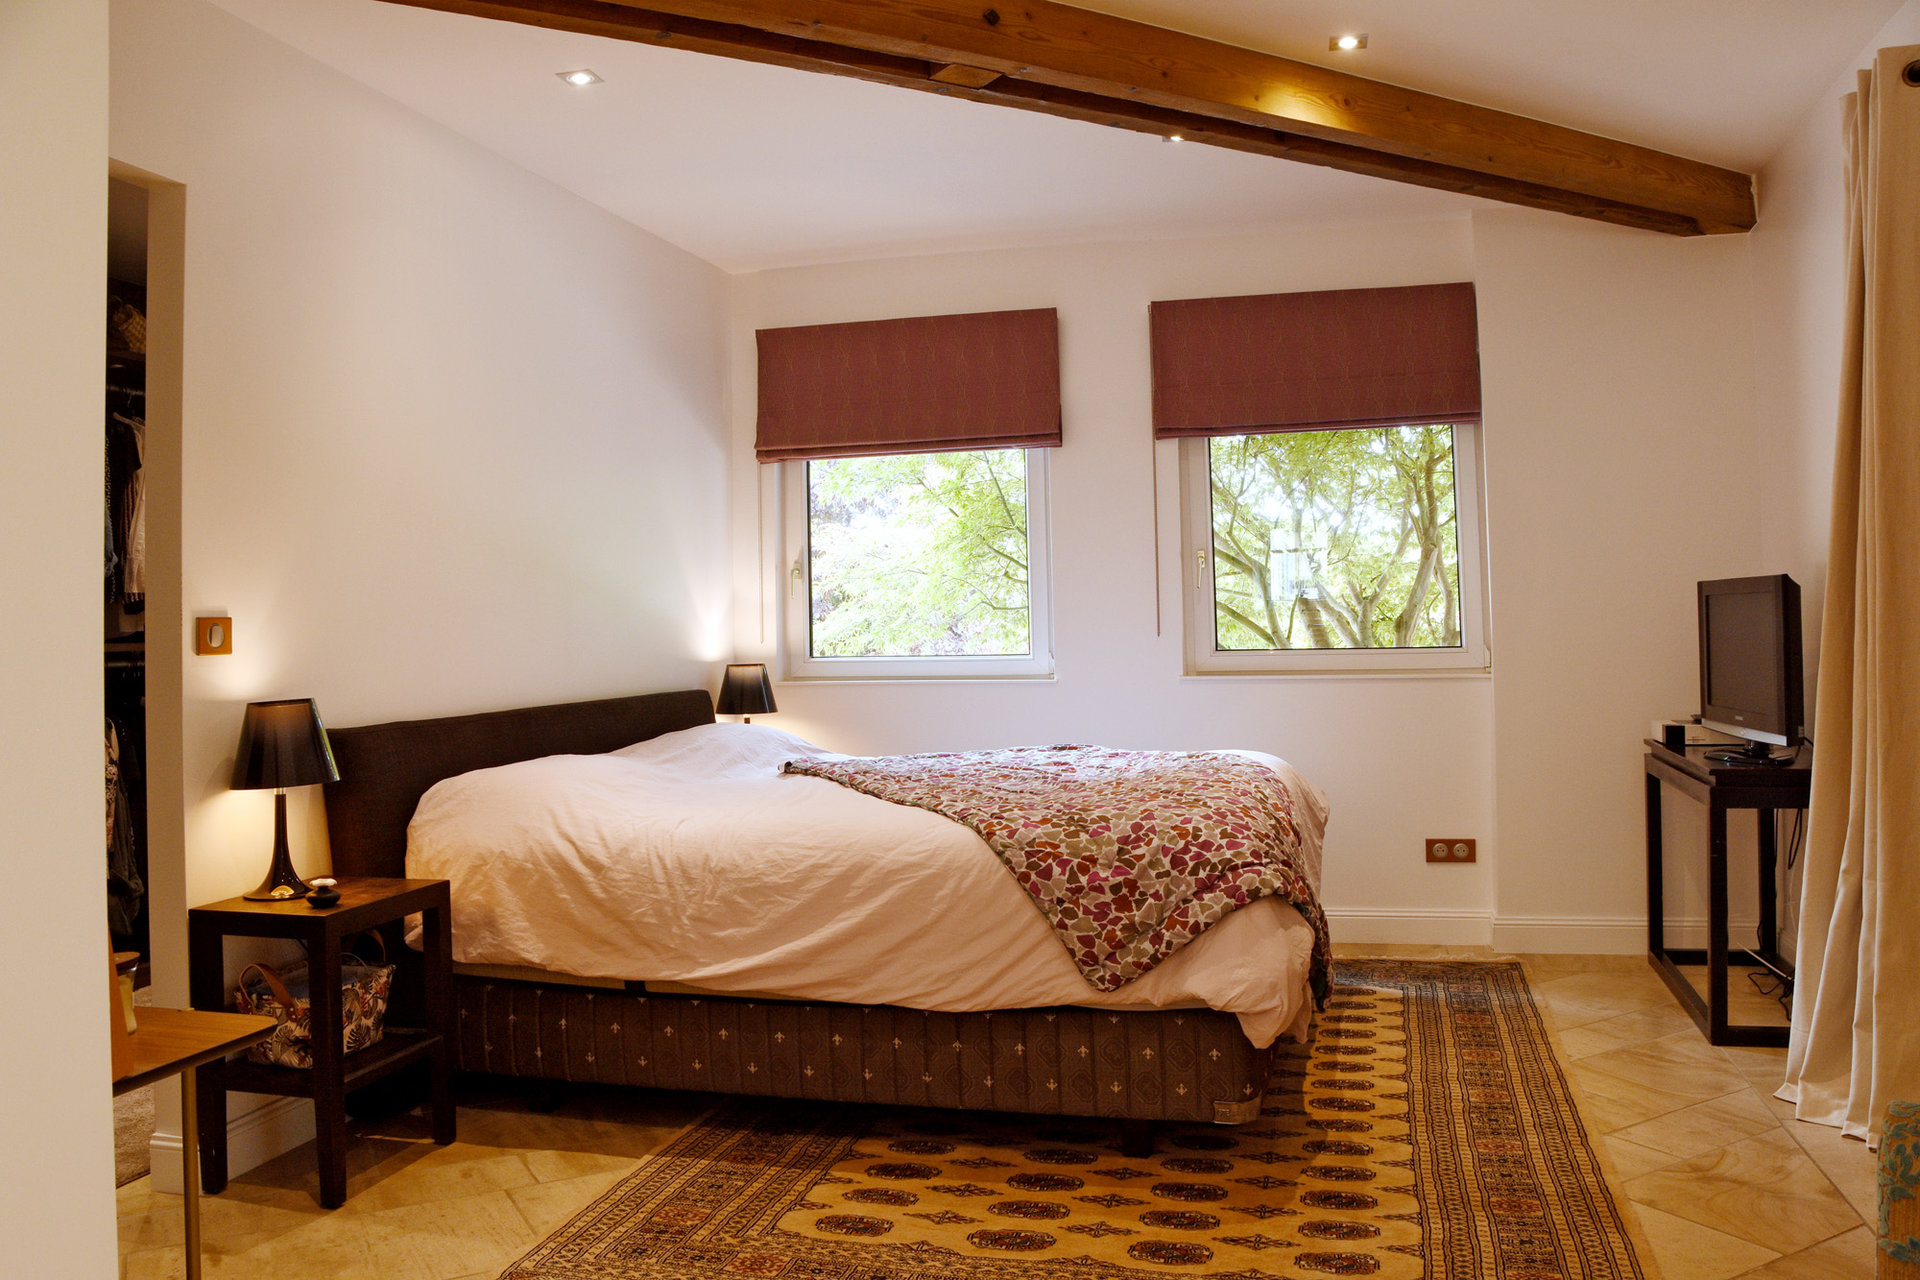 Pfettisheim - Maison et son cadre champêtre !!